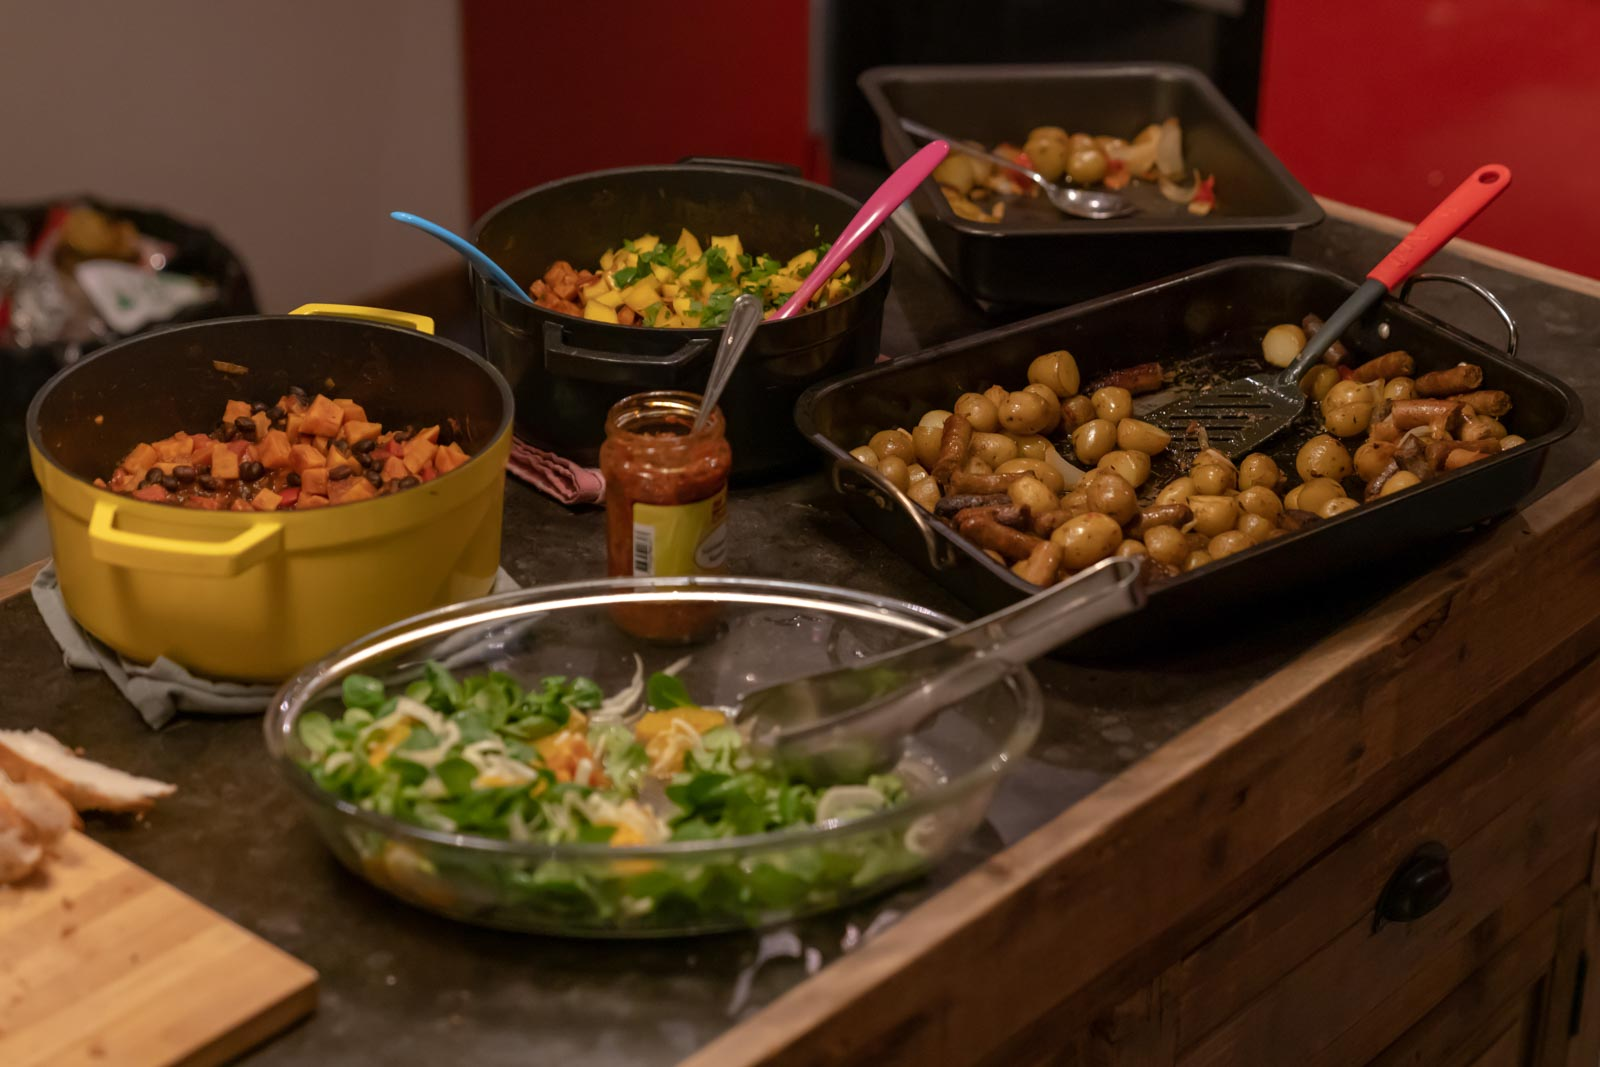 Dinner at Gam Studio